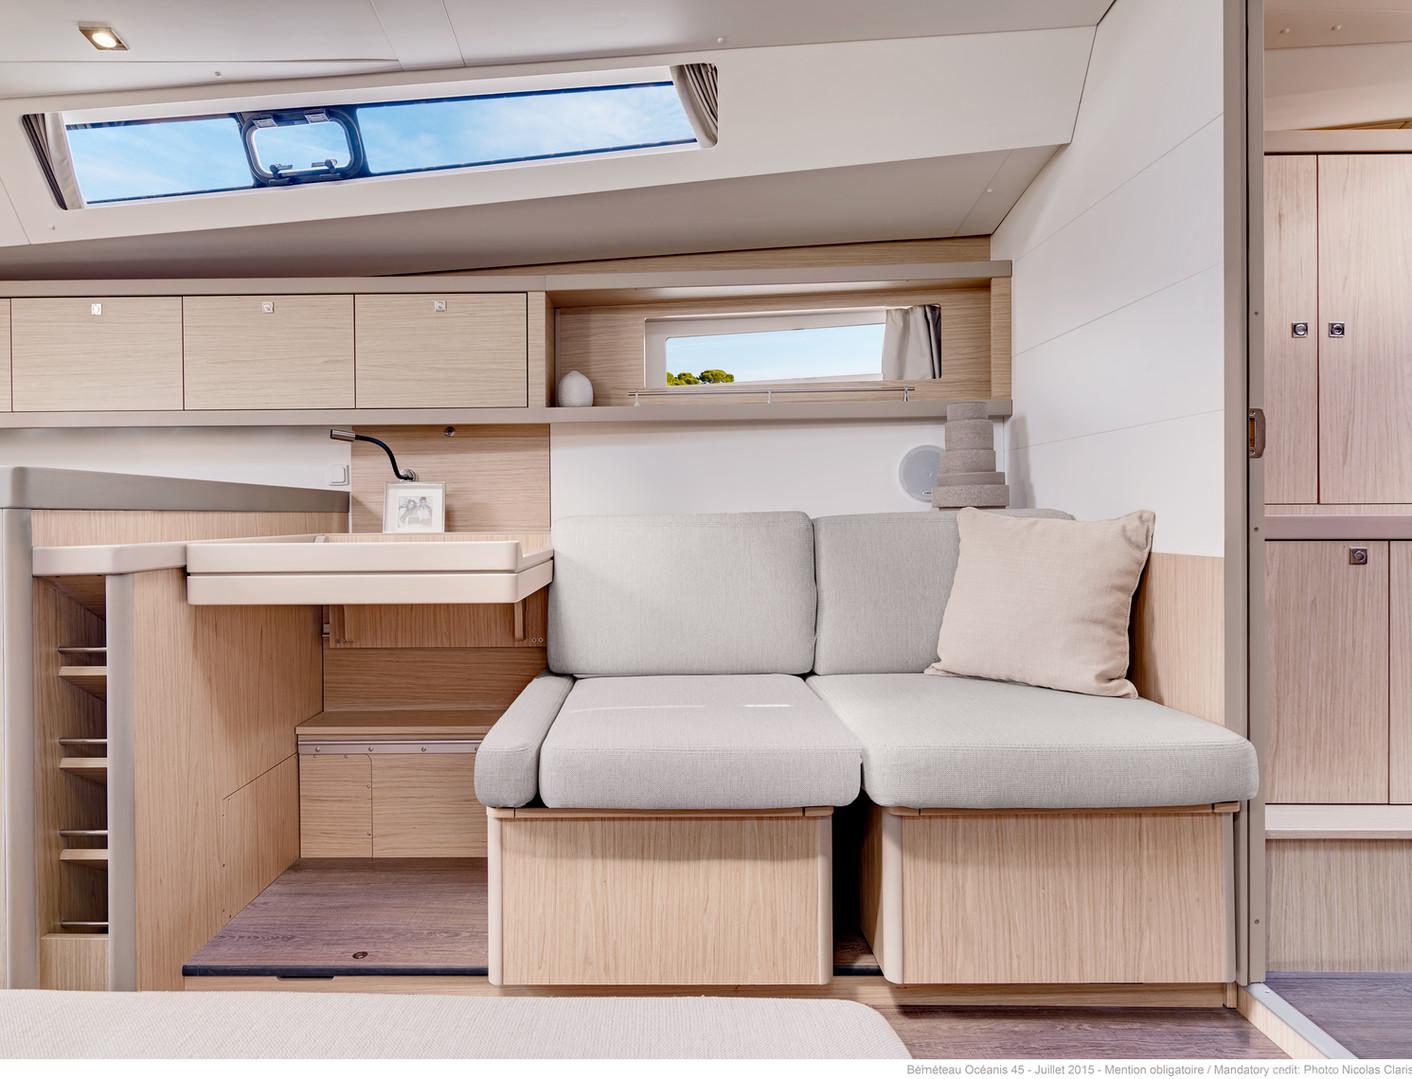 below deck: couches